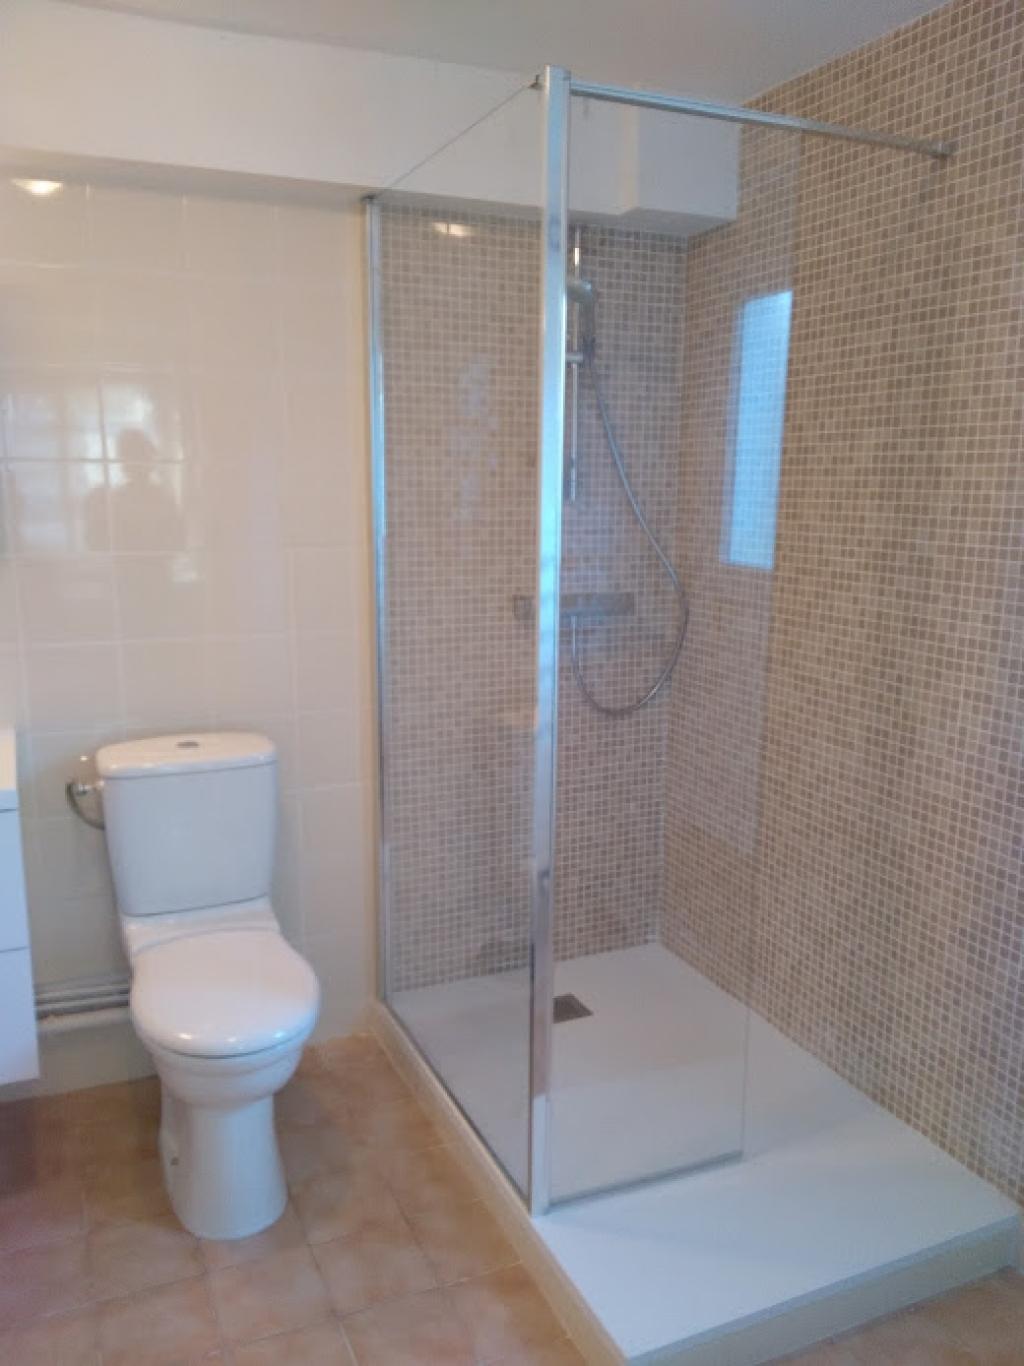 Plomberie rénovation salle de bain complète 19 Morbihan